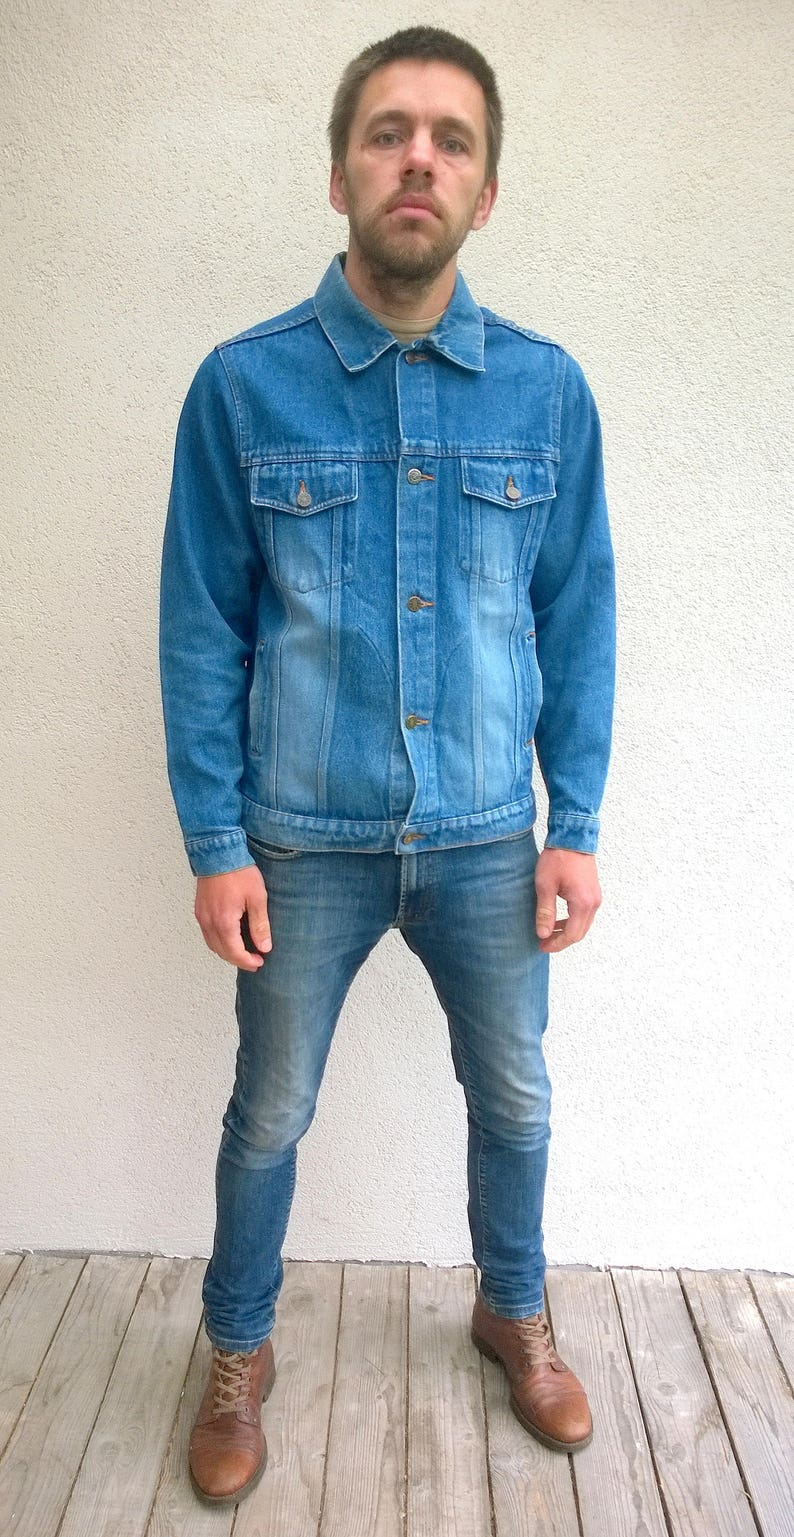 1b863989 Blue Authentic denim jacket, women denim, men's outdoor jacket, free time  jacket, vintage jean jacket, vintage workwear, L/M (TW62)